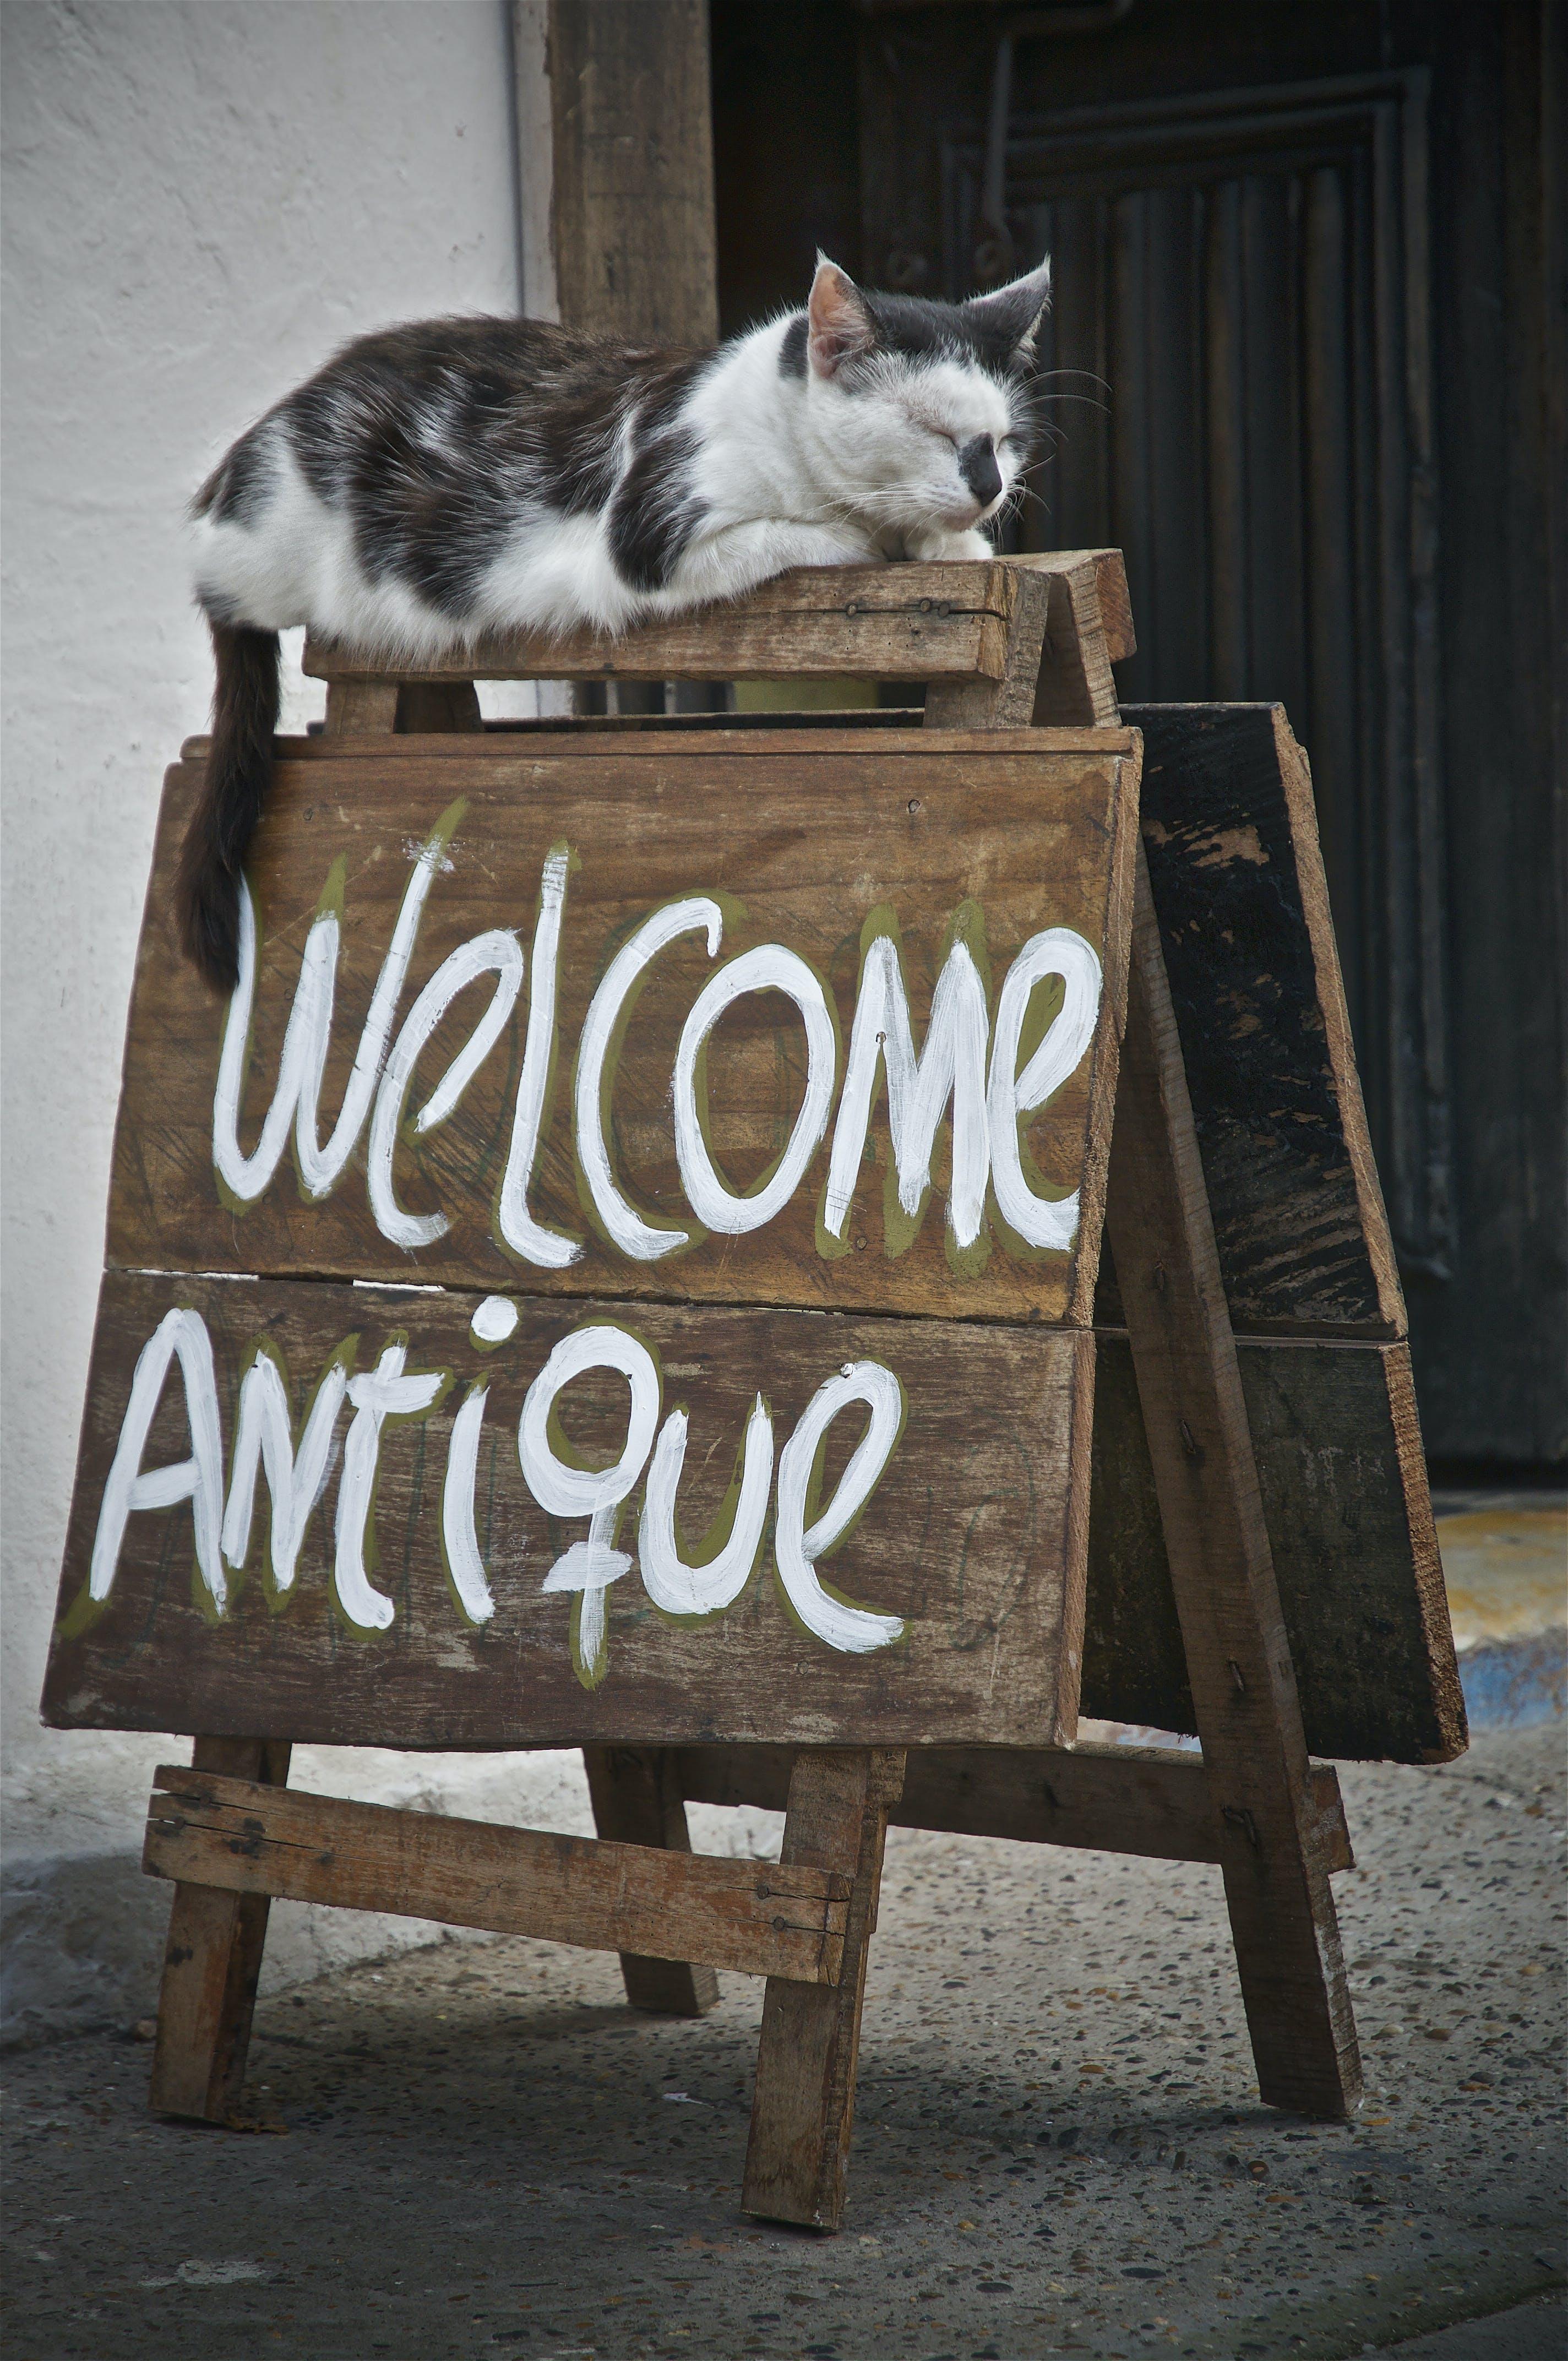 Free stock photo of antique, cat